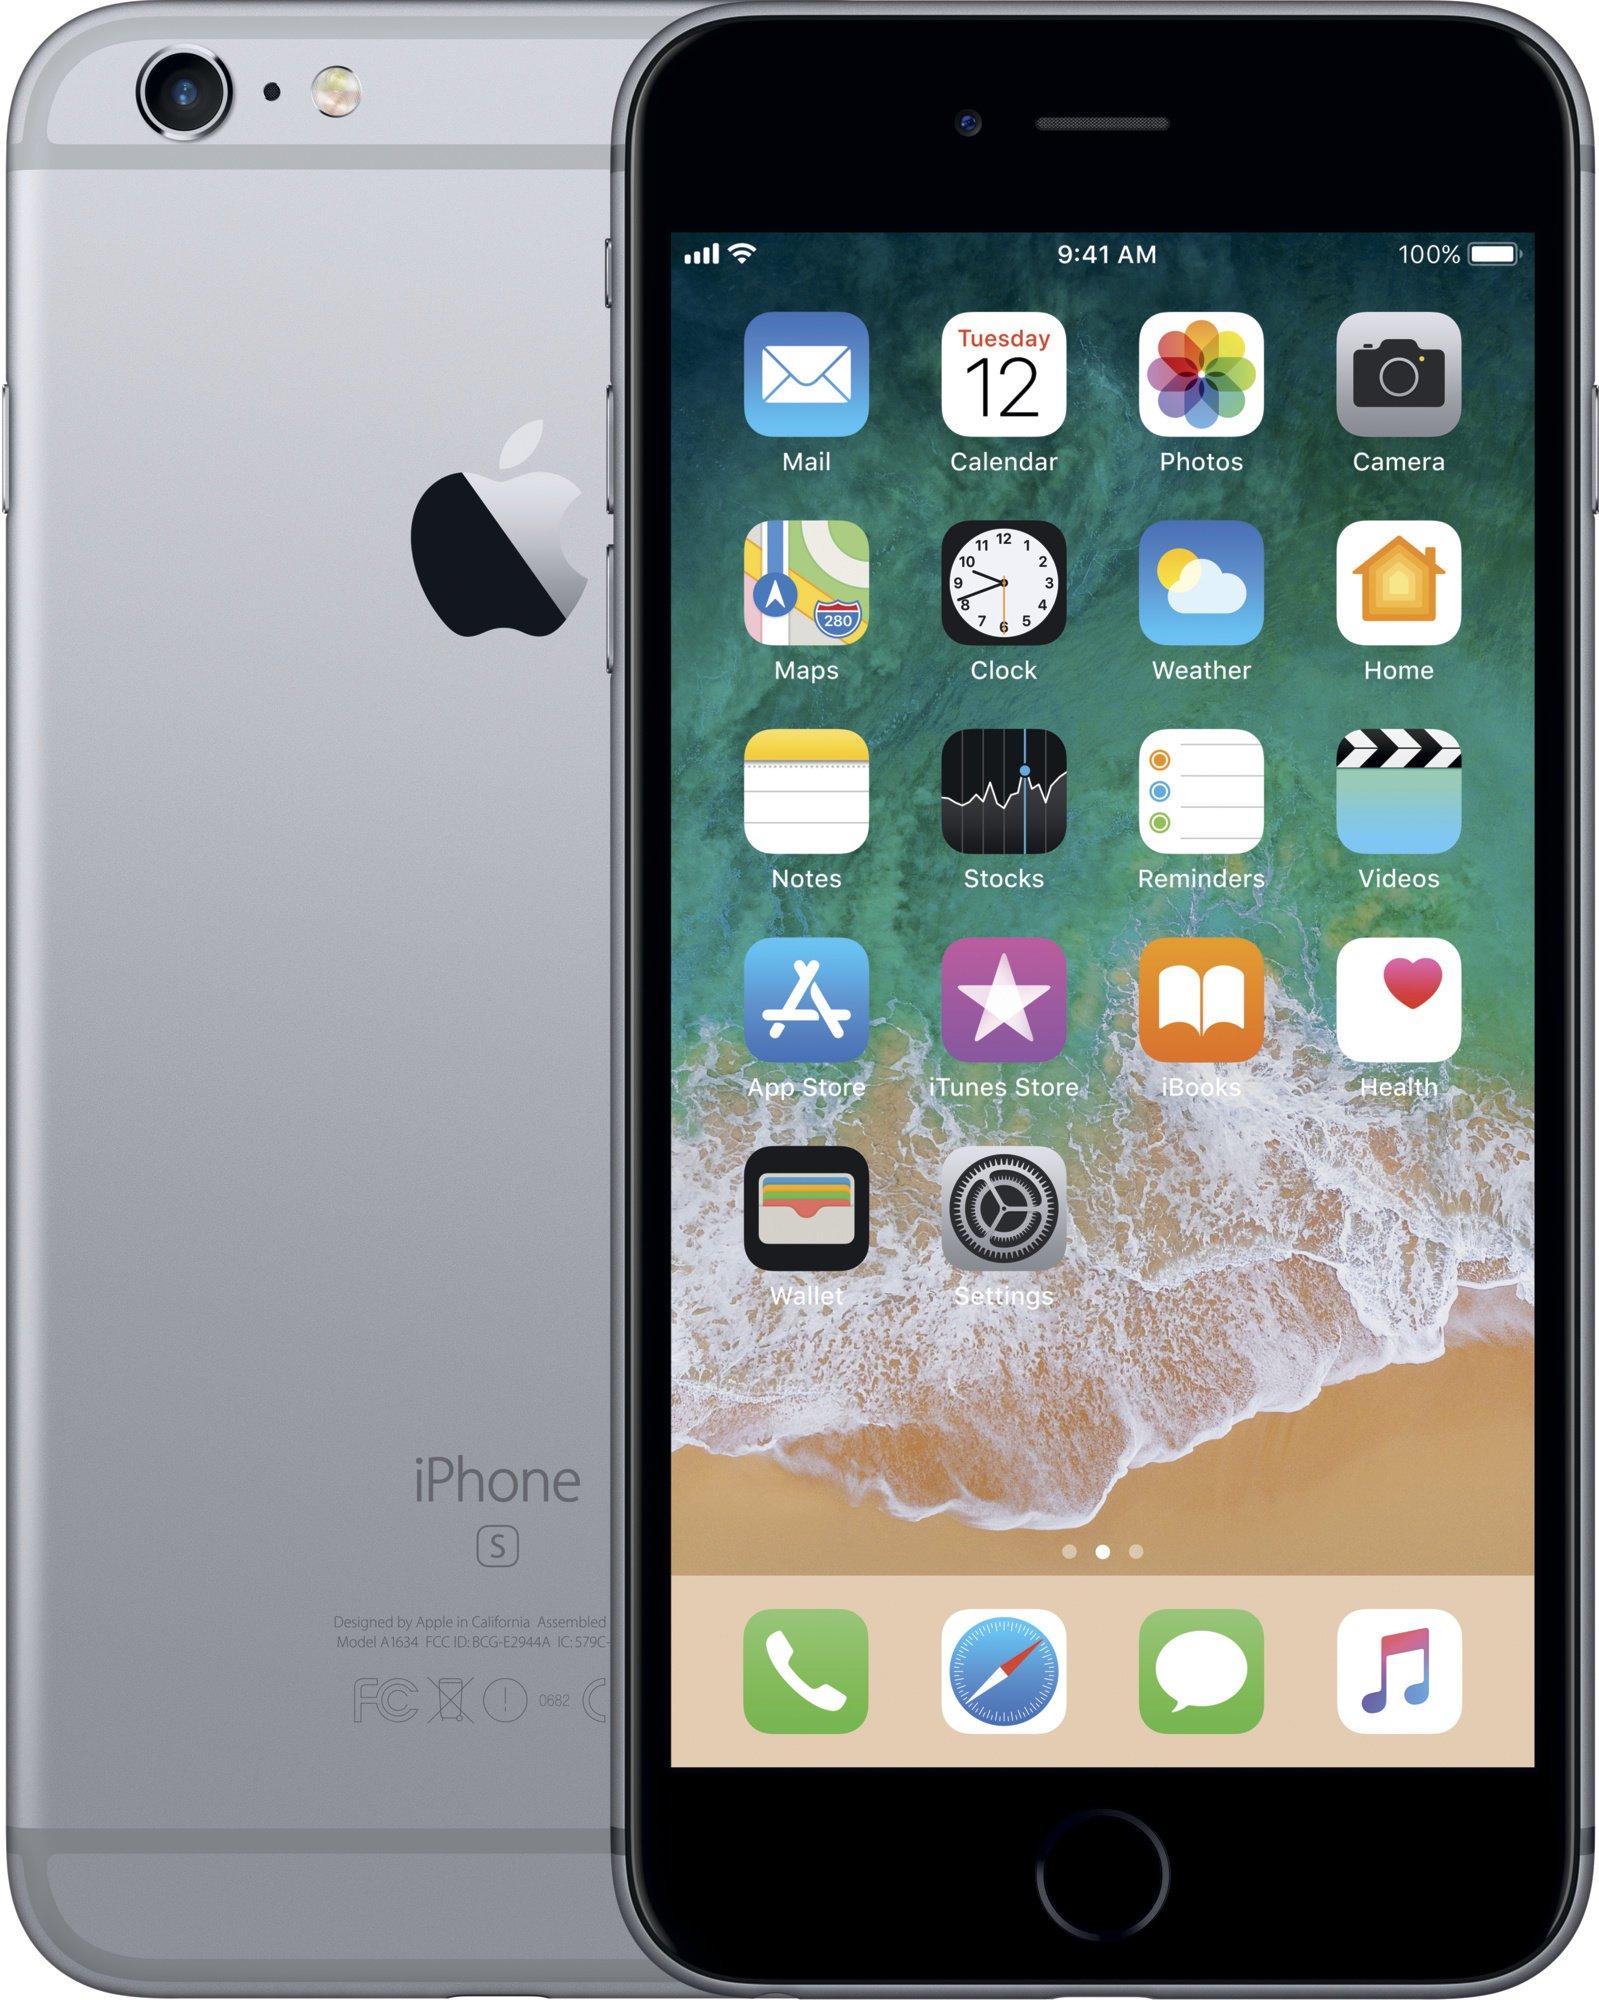 Apple iPhone 6 Plus 128GB Space Gray